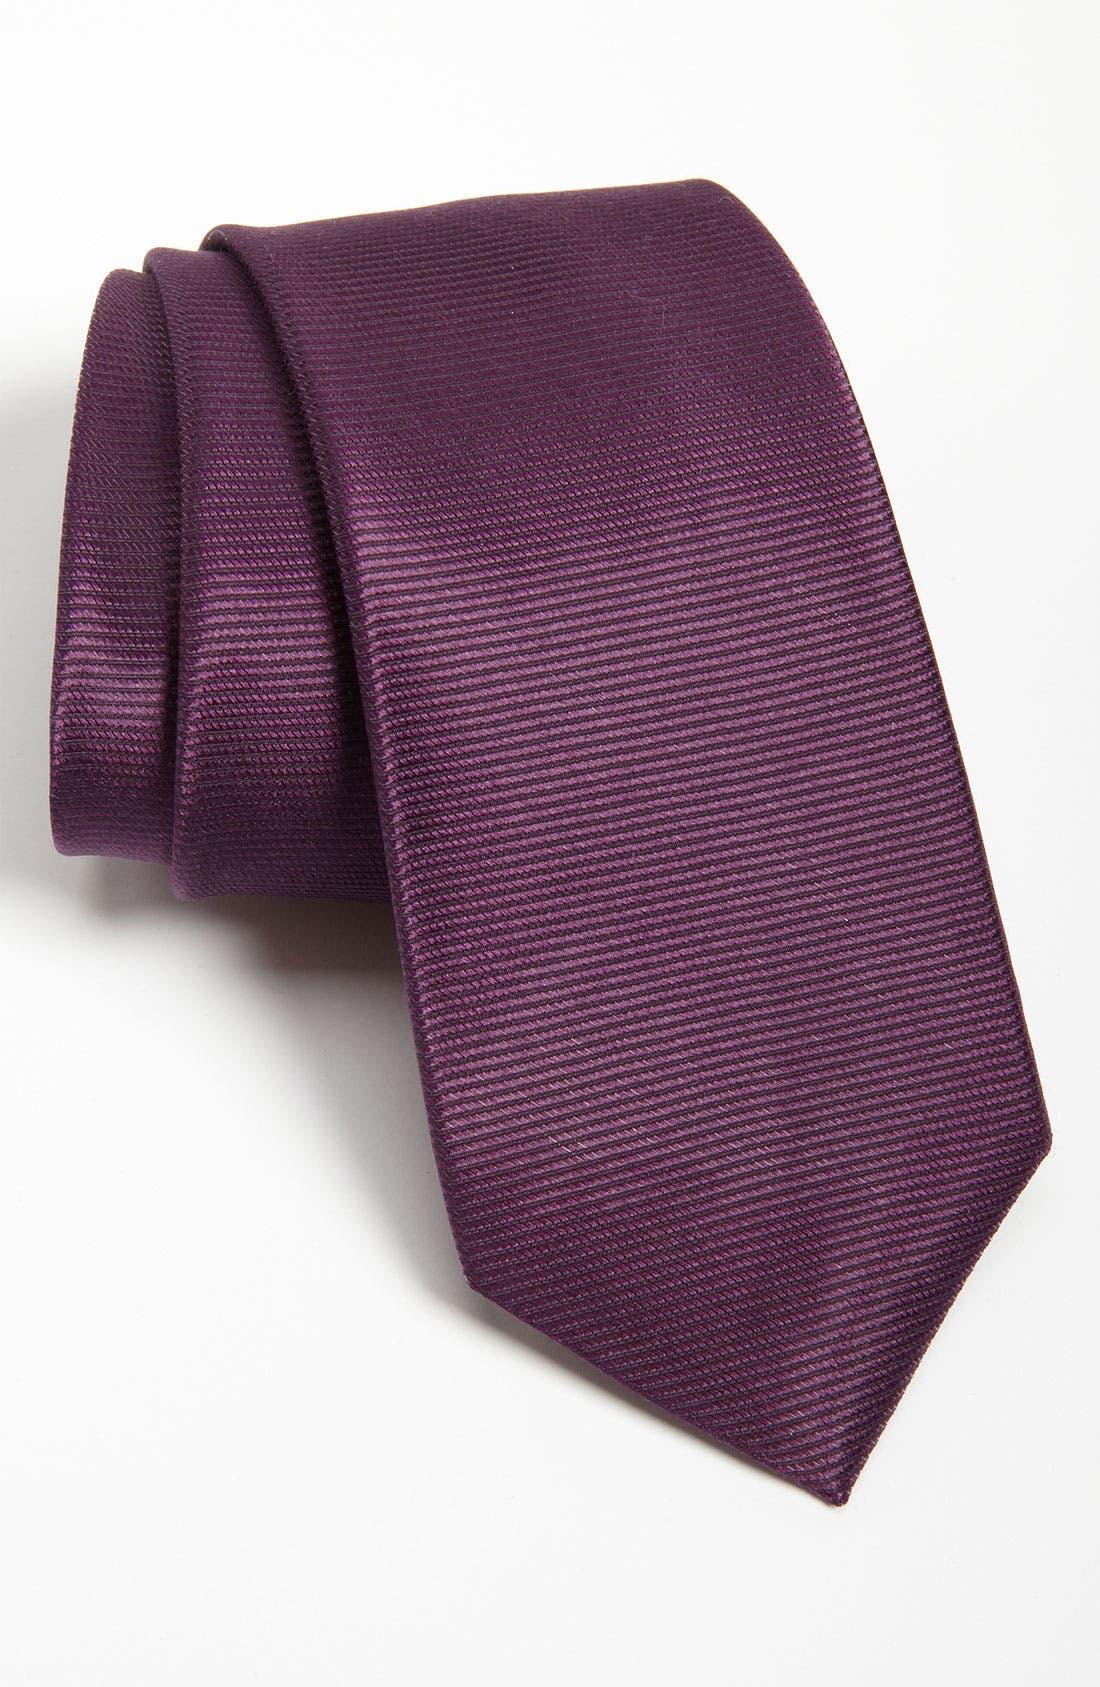 Alternate Image 1 Selected - Calibrate Woven Silk Tie